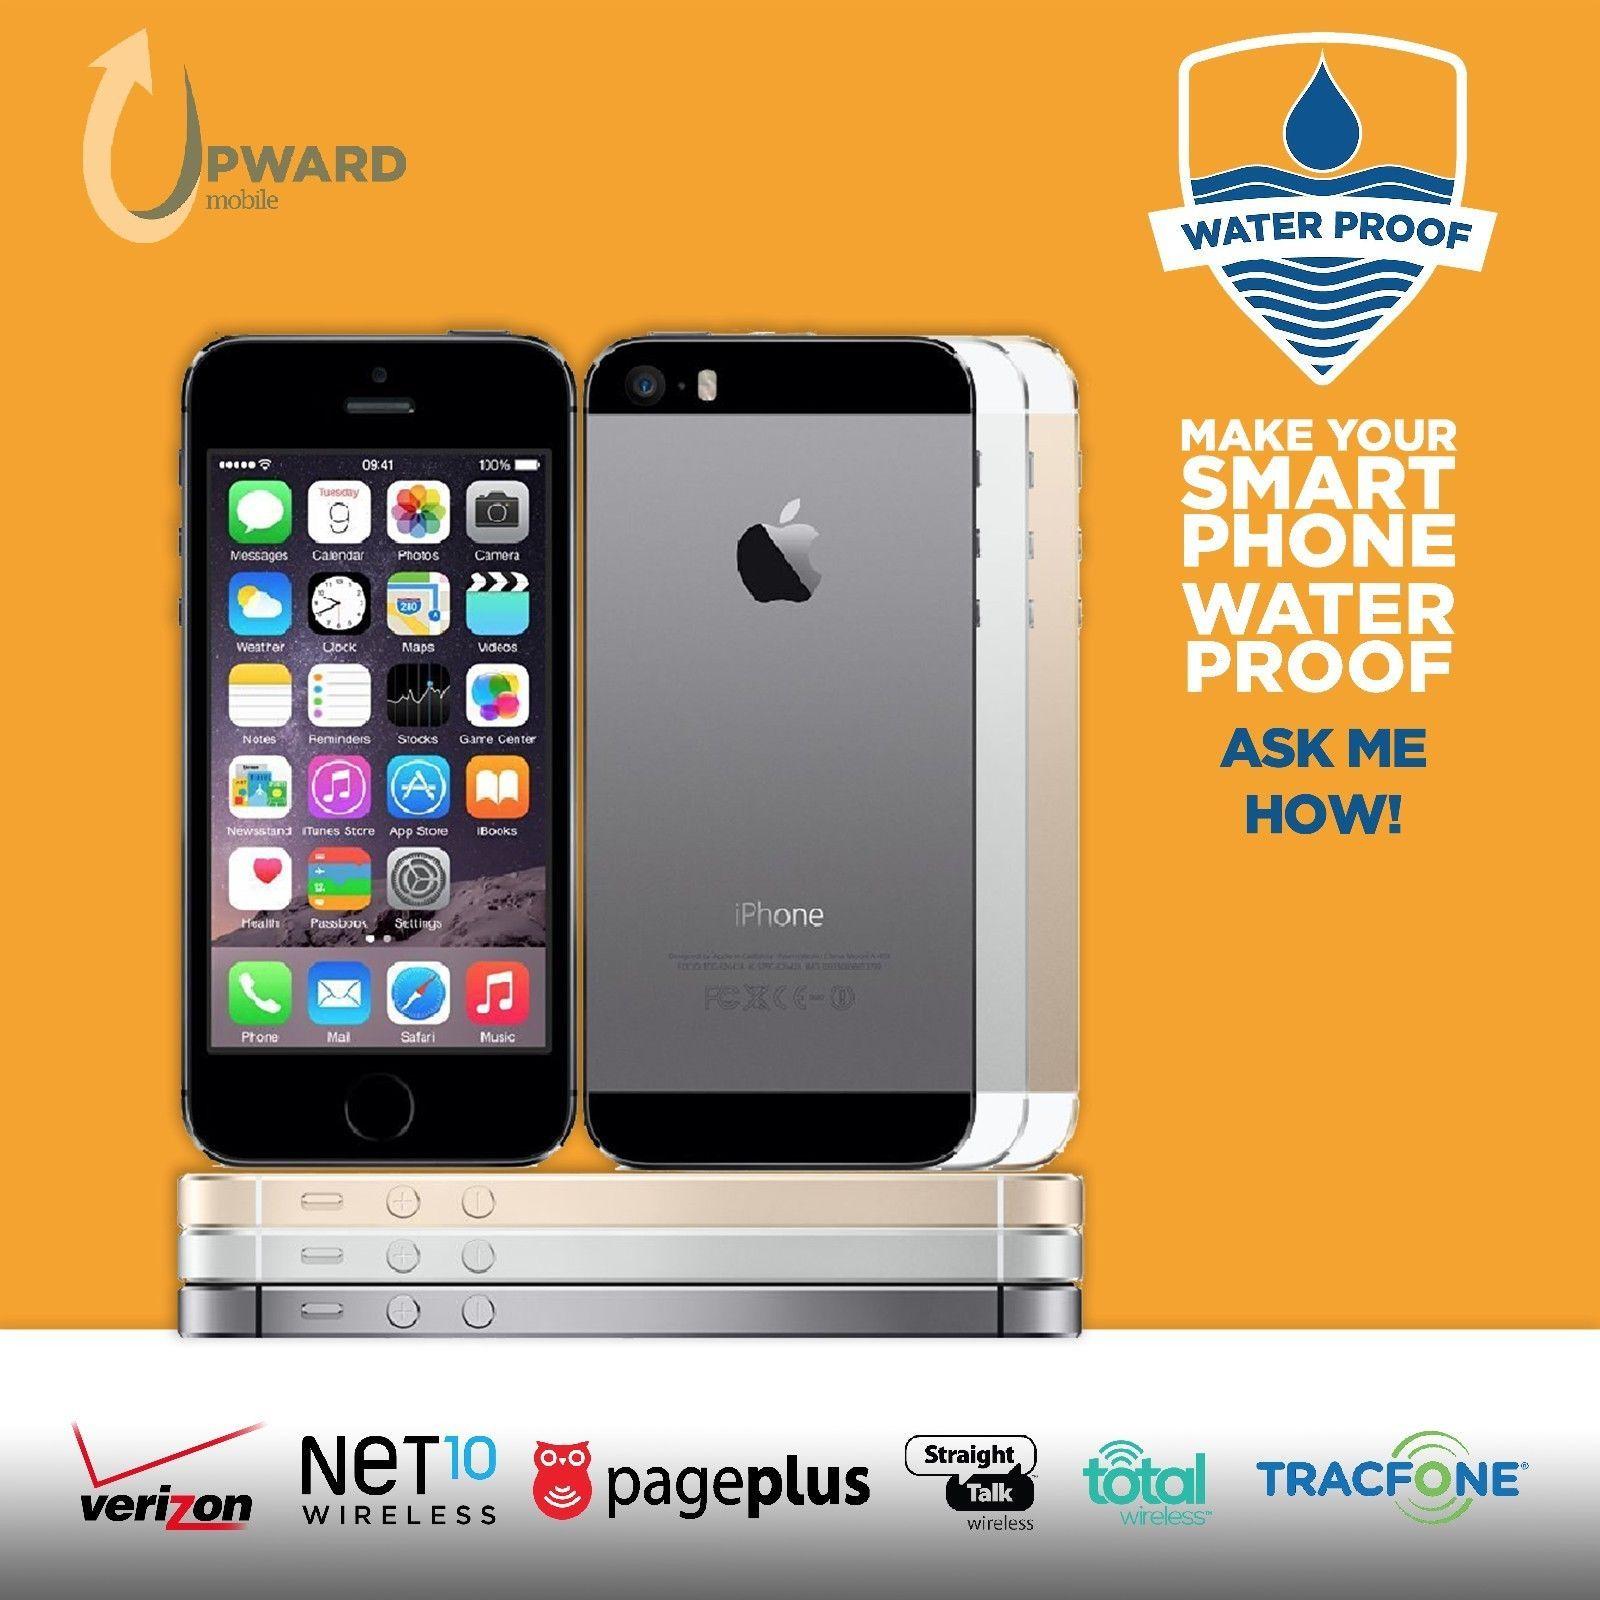 Apple iphone 5s 163264gb verizon straight talk net10